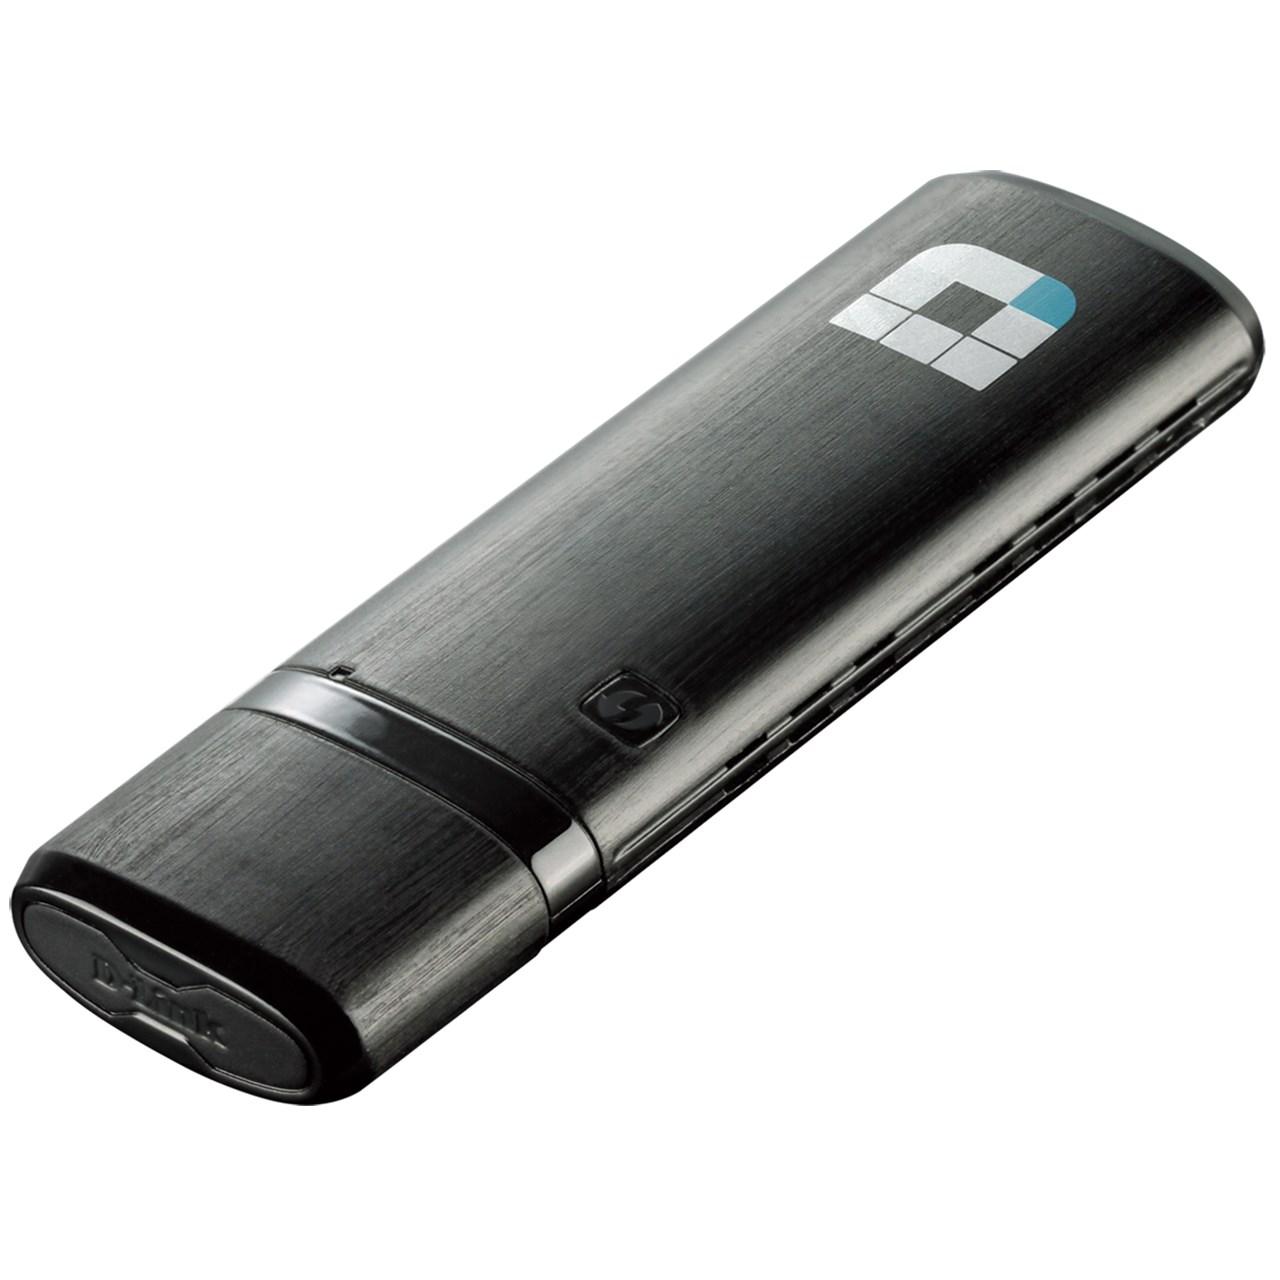 کارت شبکه USB بیسیم و دوباند دی-لینک مدل DWA-182